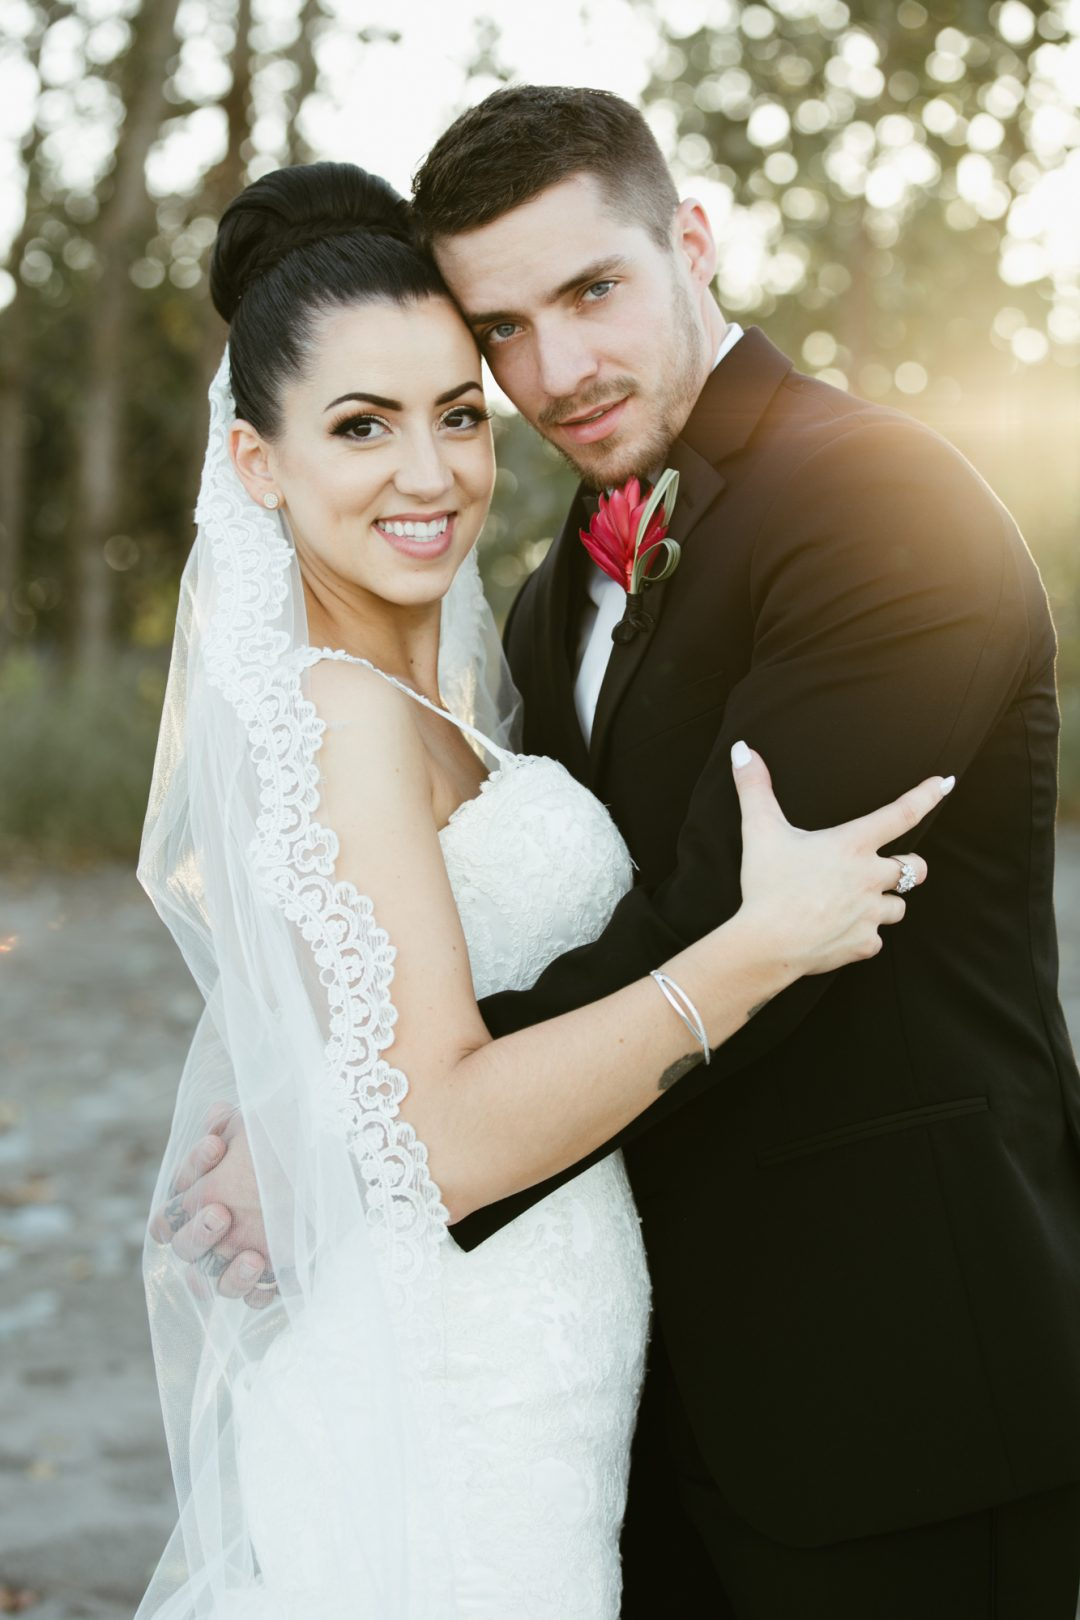 Kelsey & Ryan 10.07.17